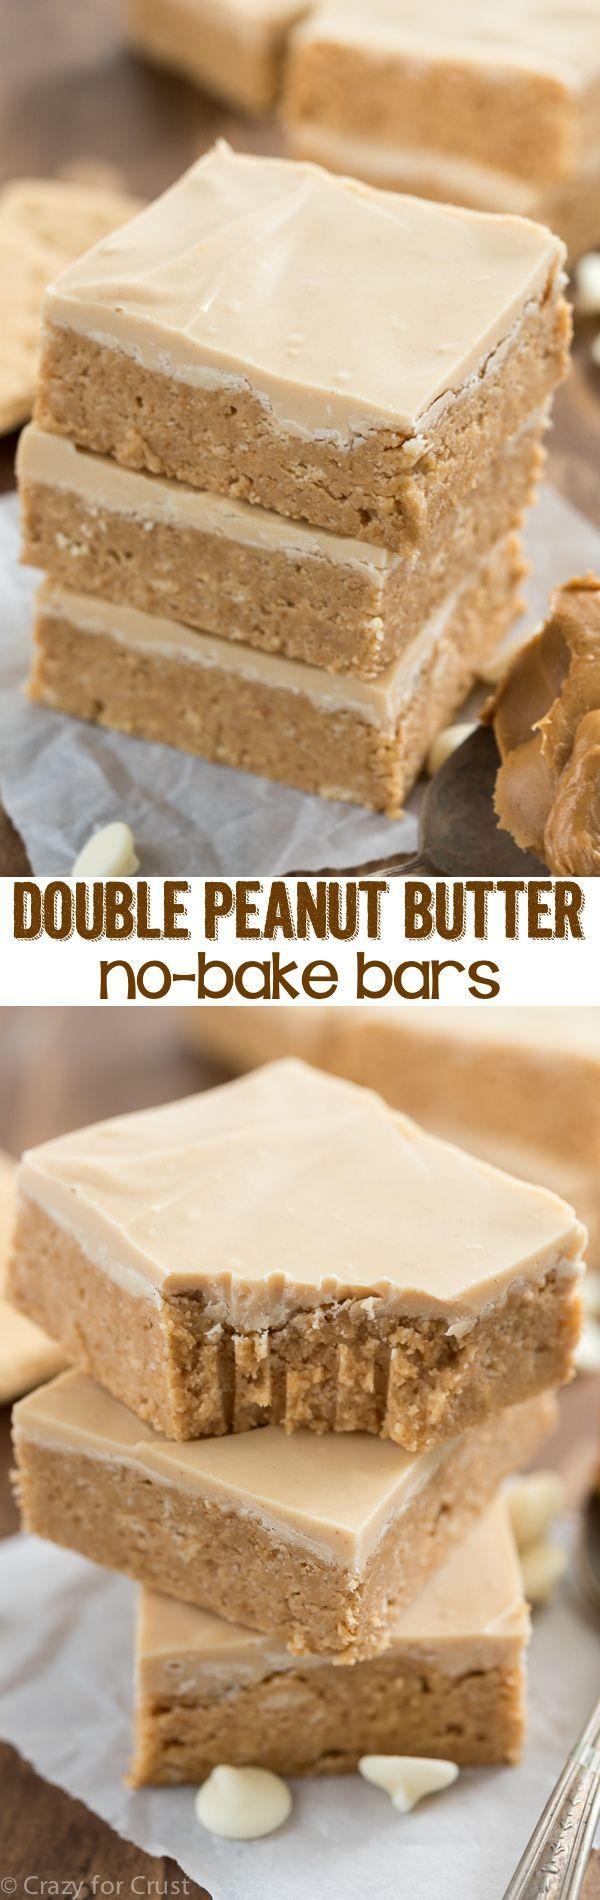 No-Bake Double Peanut Butter Bars